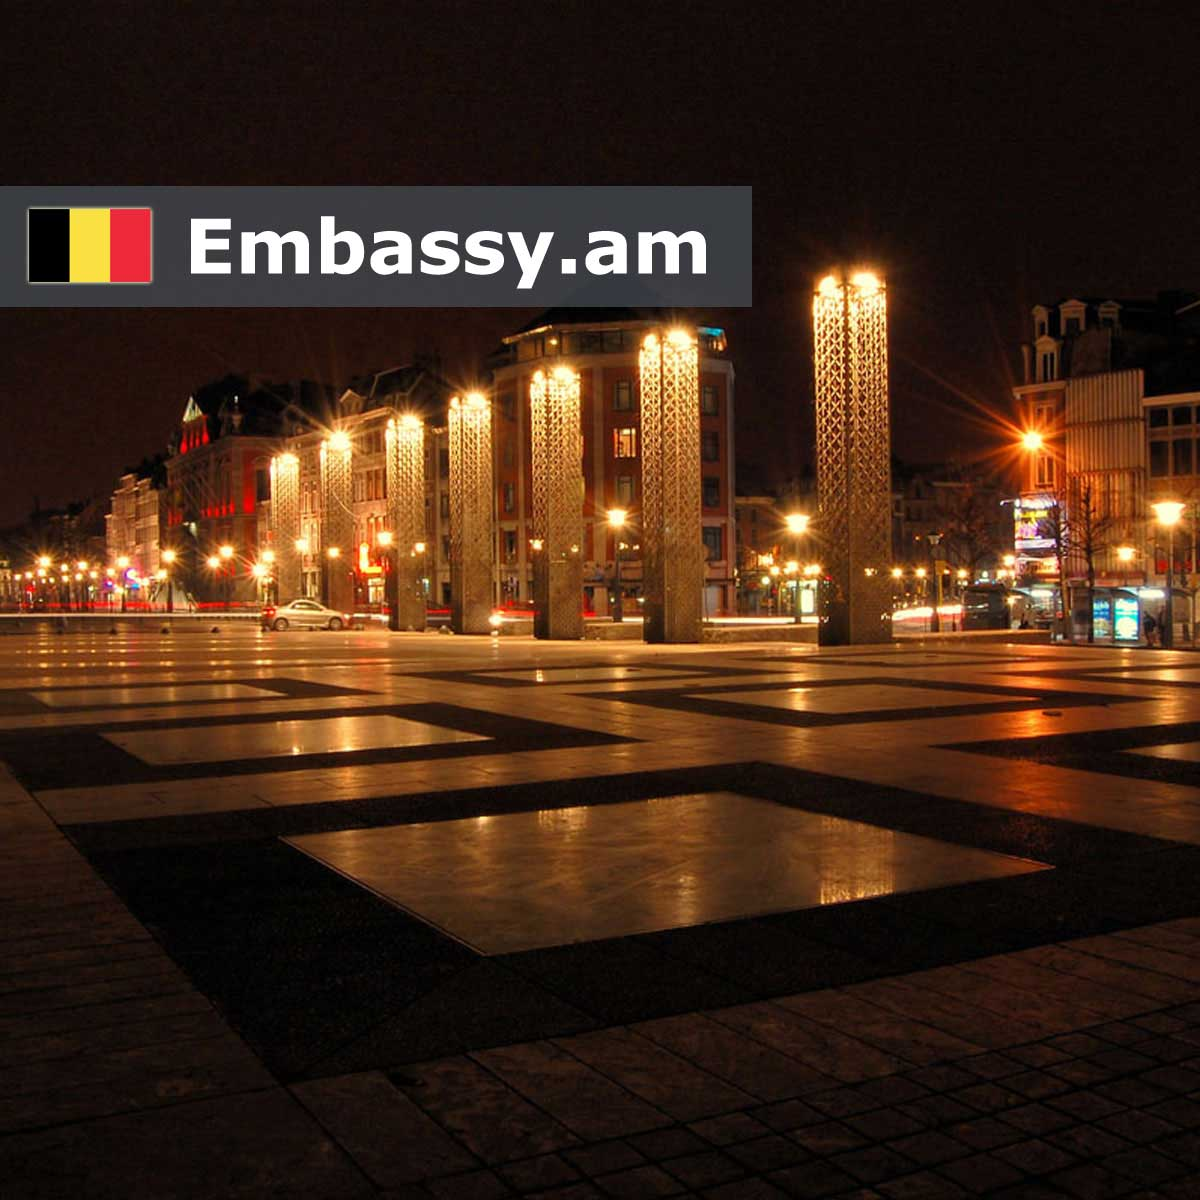 Liege - Hotels in Belgium - Embassy.am